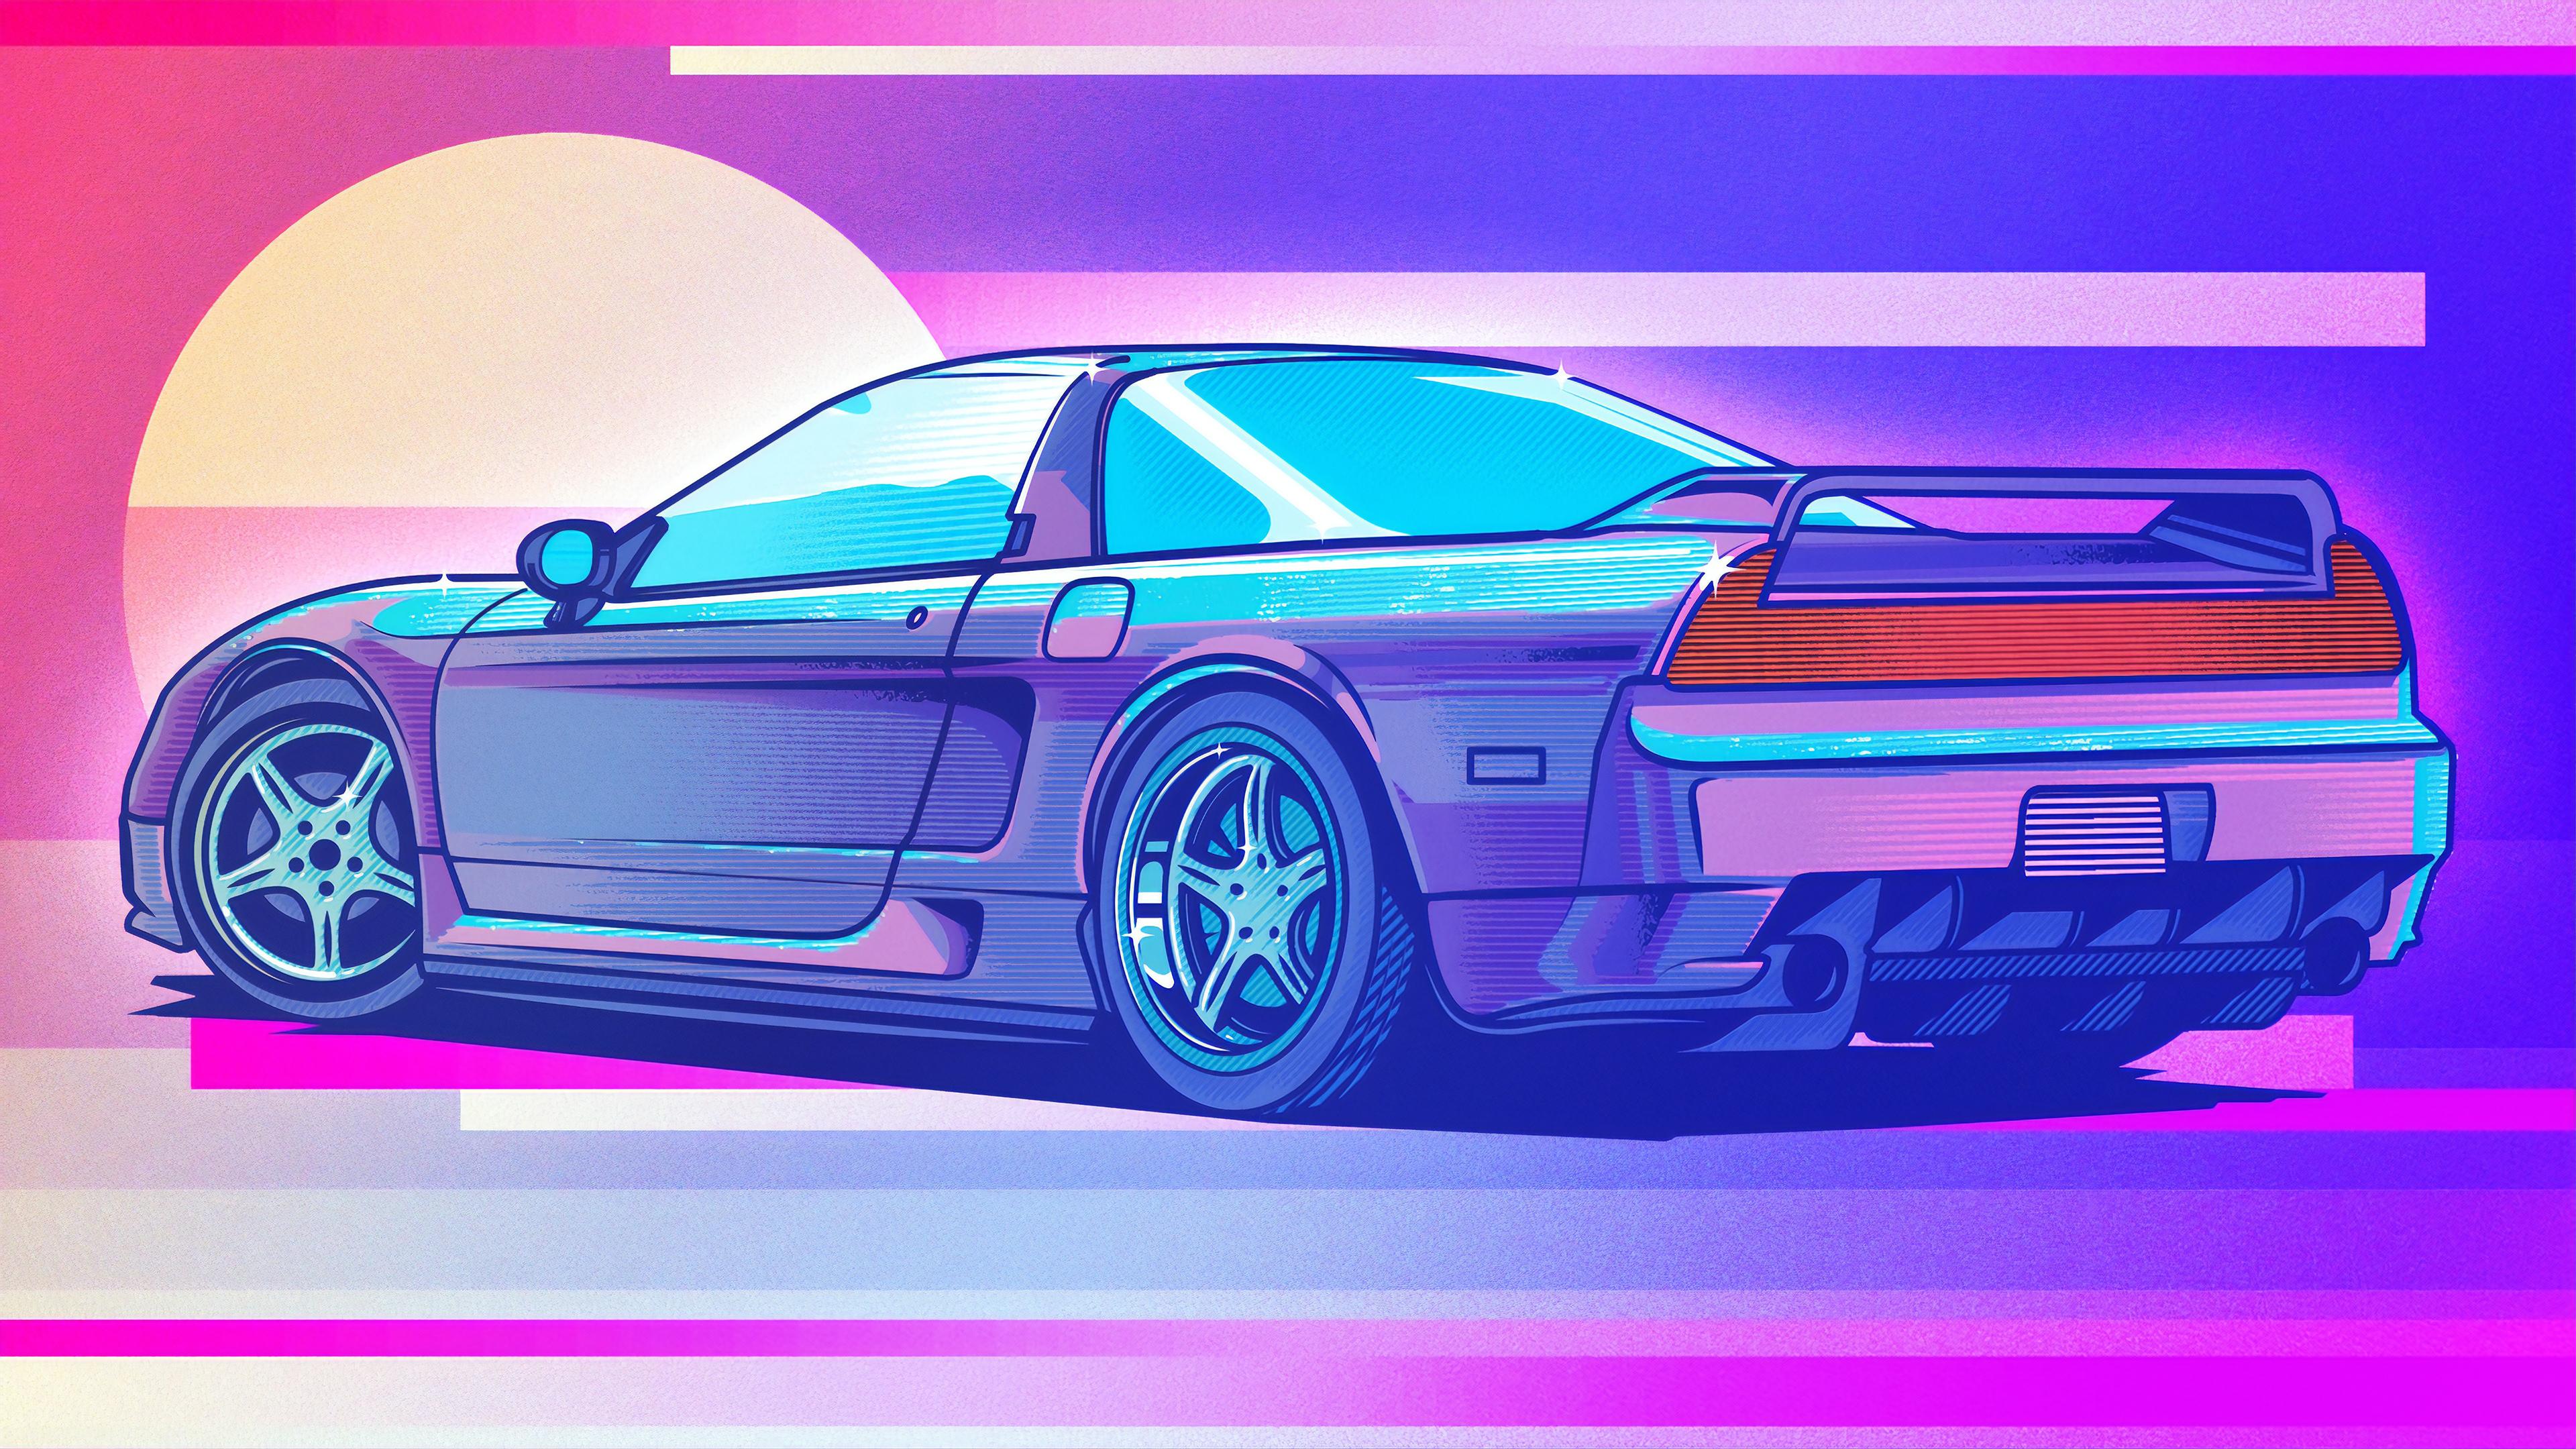 Honda Nsx Retrowave Art 4k Hd Cars 4k Wallpapers Images